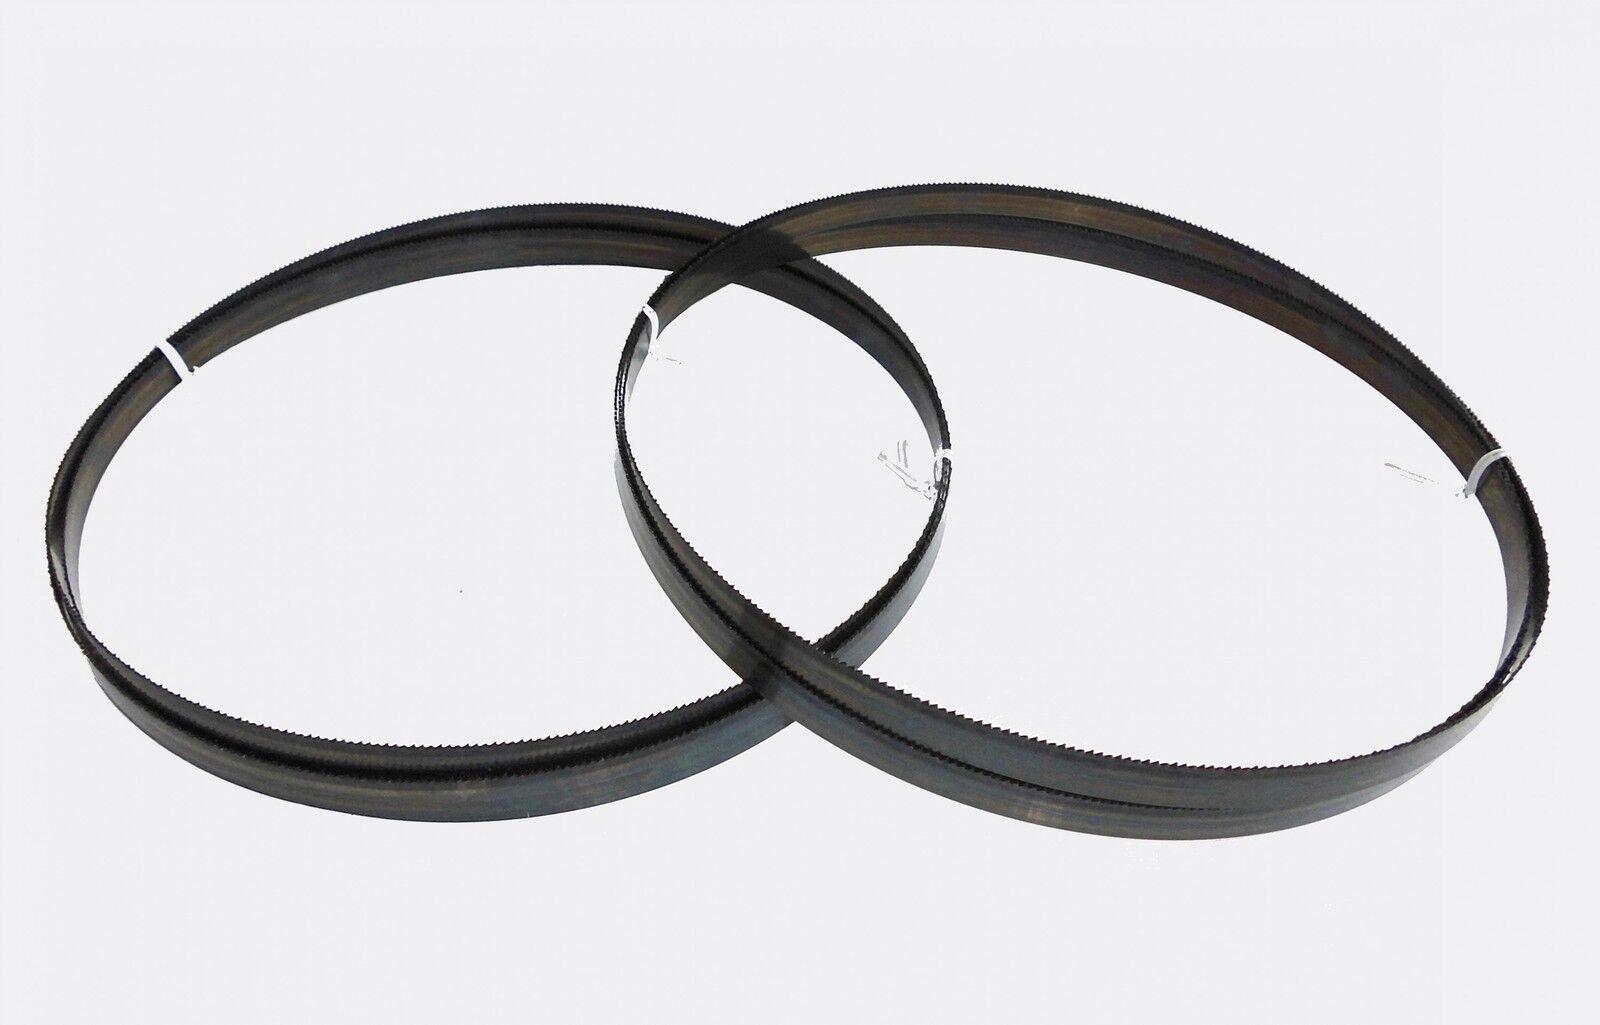 2 X Sägebänder Sägeband 2240 Mm X 13 Mm X 0,65 Mm 14 Zpz Metall Rohre Metabo